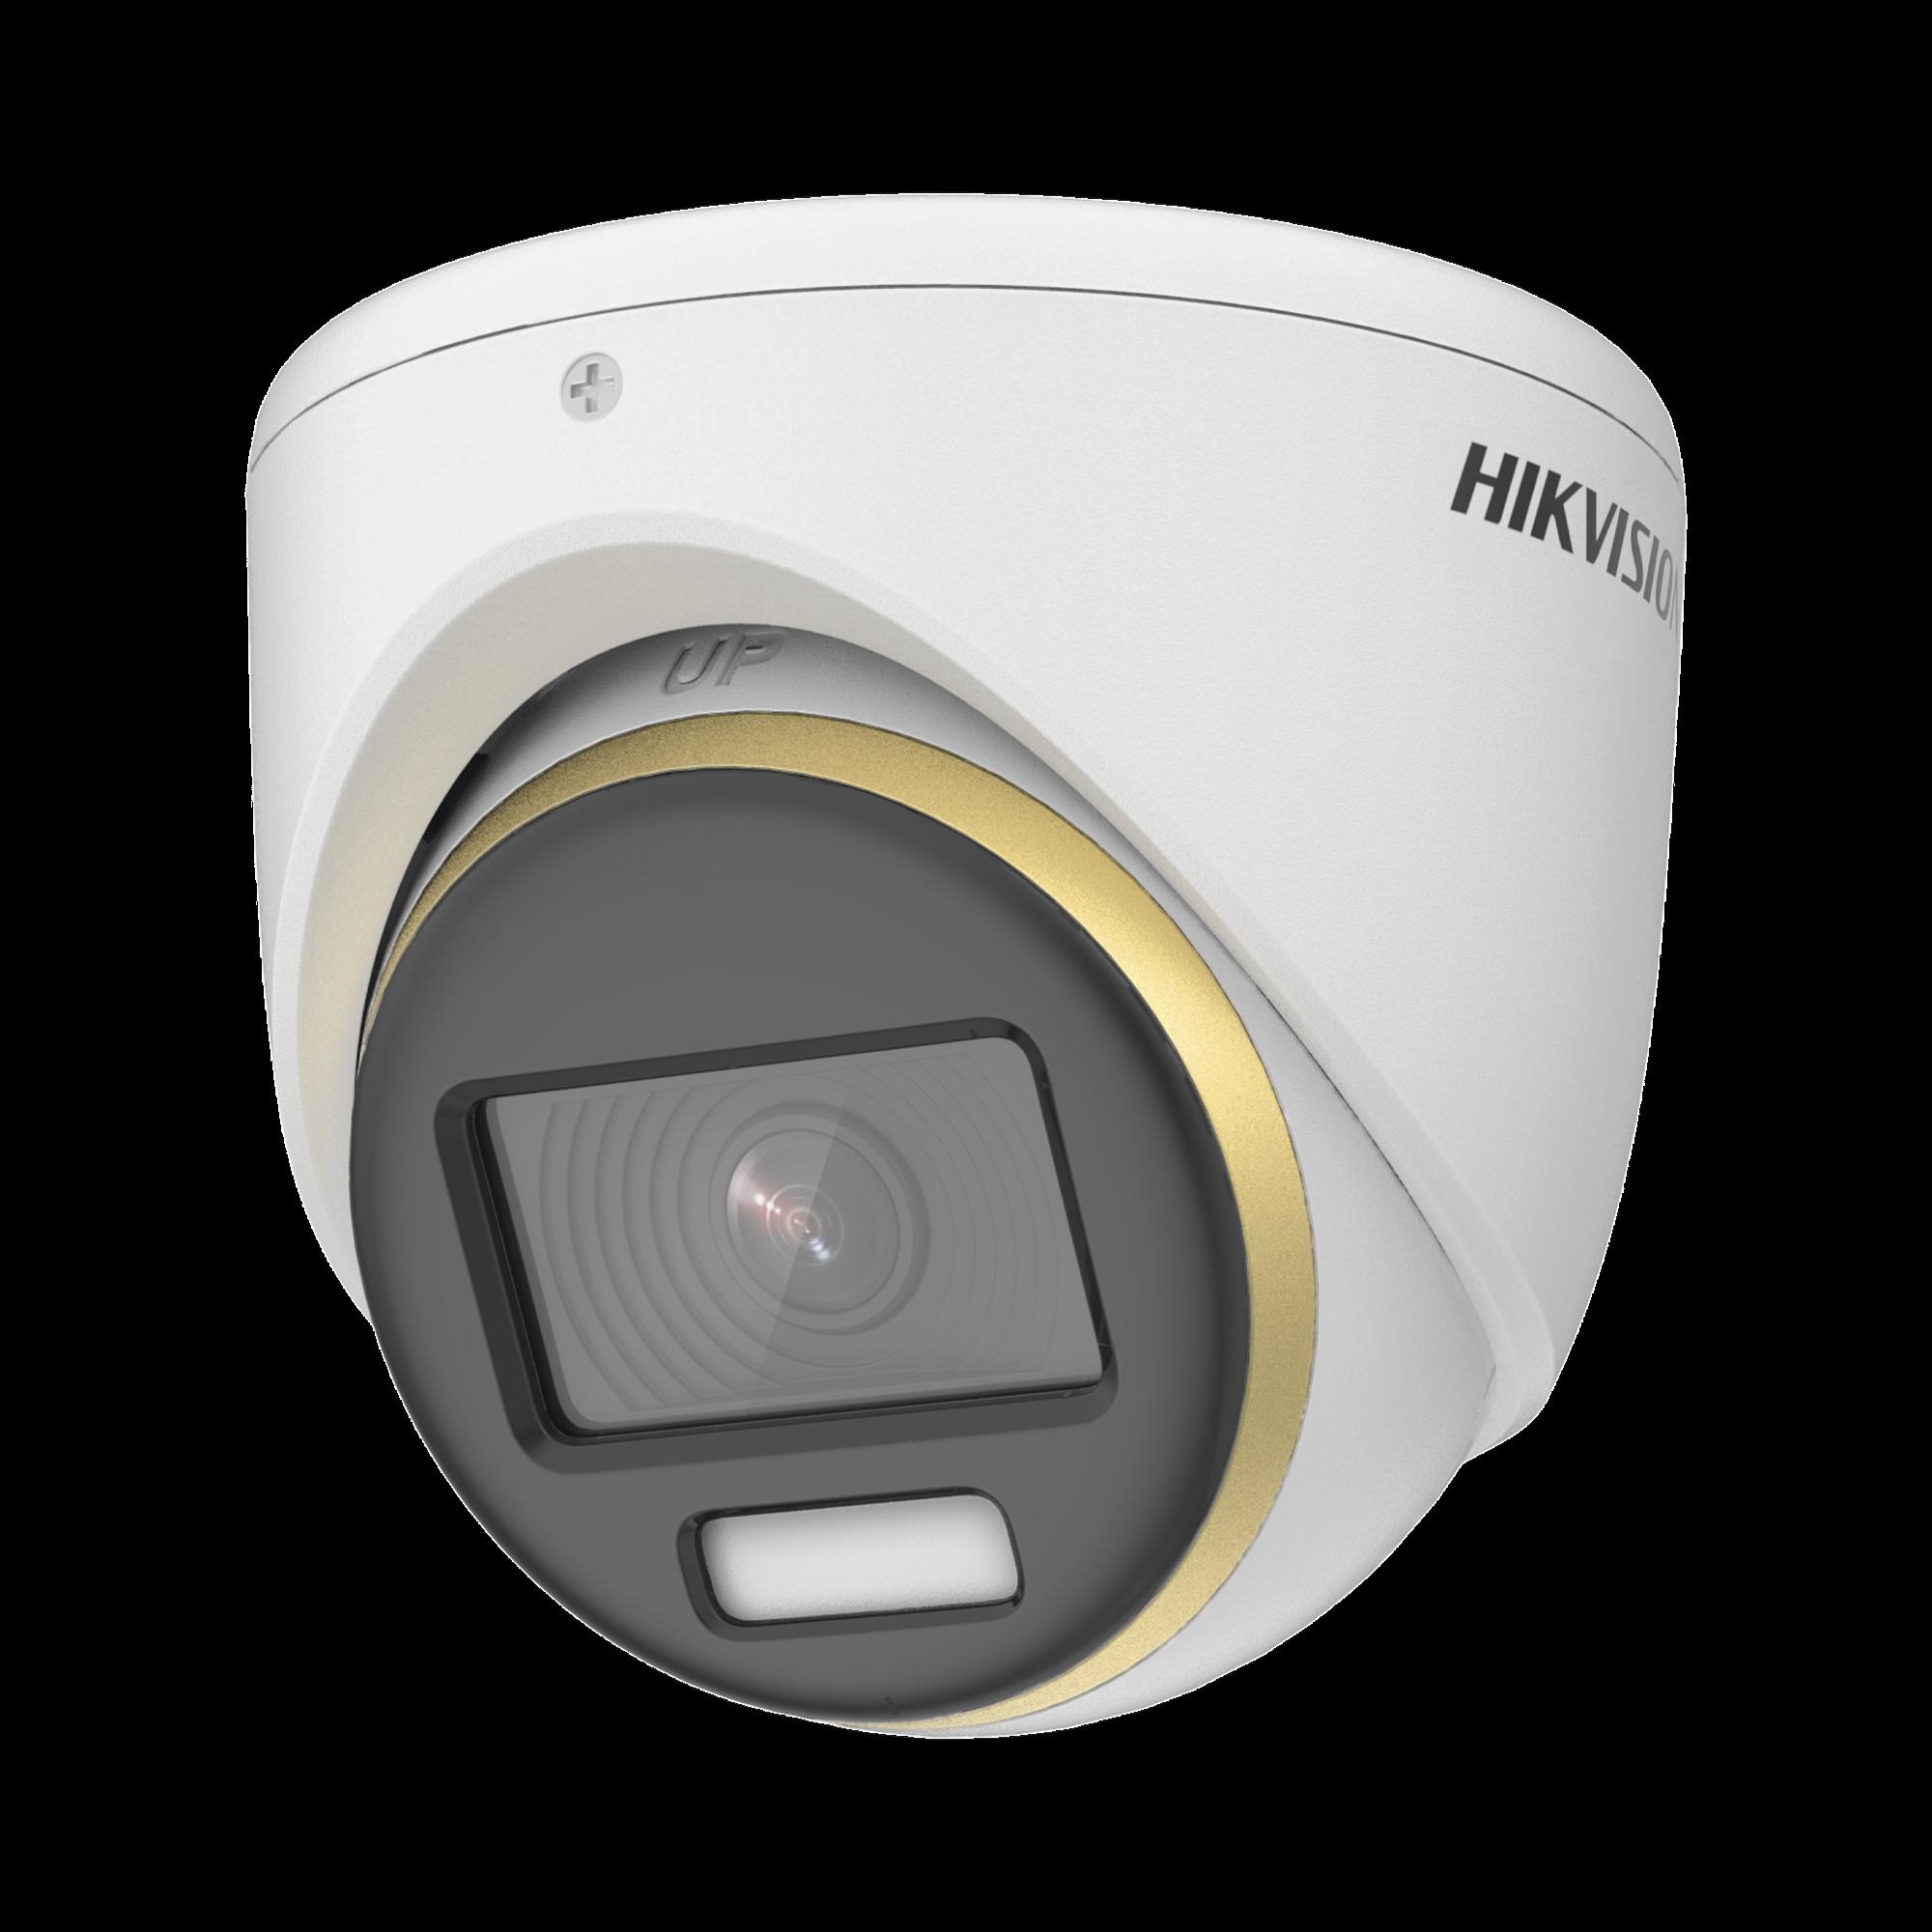 Turret TURBOHD 2 Megapixel (1080p) / Imagen a color 24/7 / Lente 2.8 mm / Luz Blanca 20 mts / Exterior IP67 / WDR 130 dB